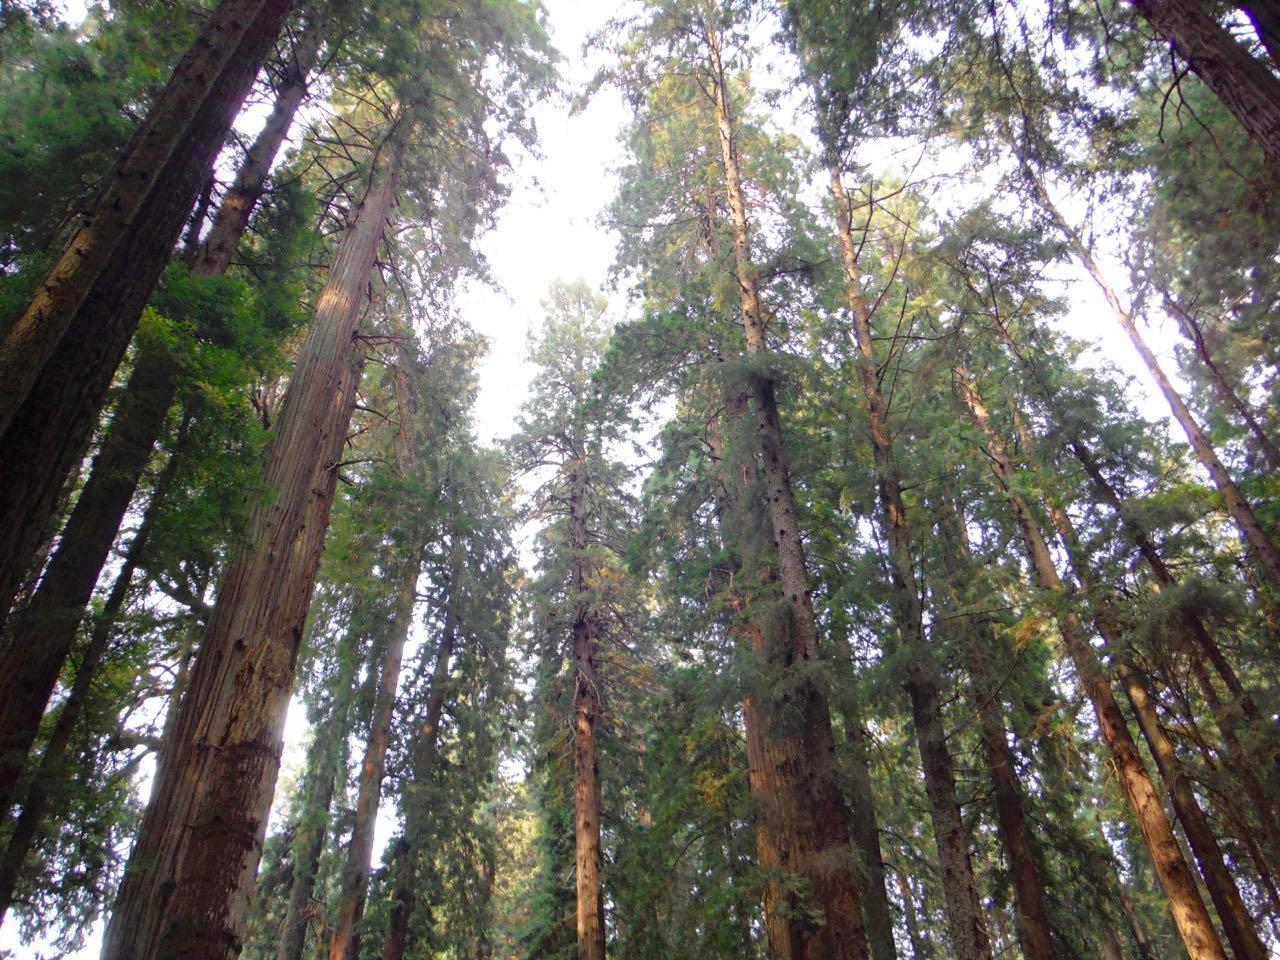 Redwoods 2017 10 08 112 Of 287